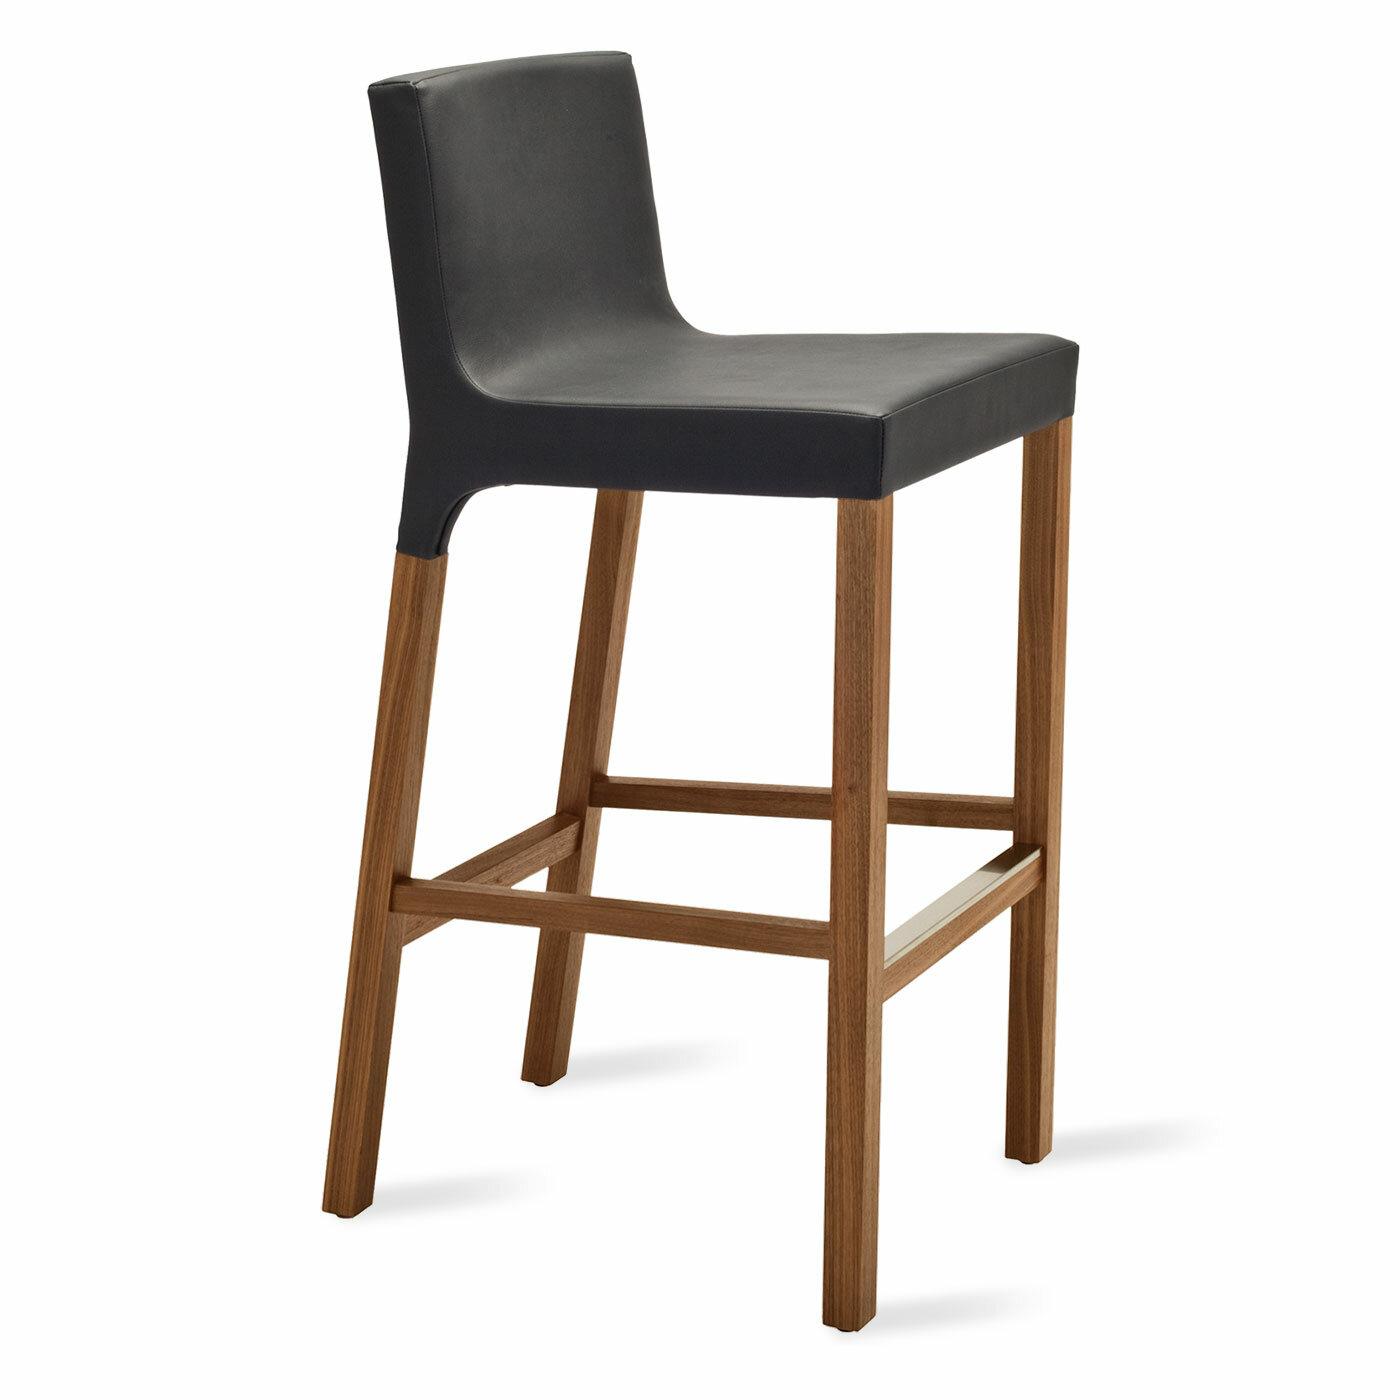 Superb Knicker Bar Counter Stool Reviews Allmodern Bralicious Painted Fabric Chair Ideas Braliciousco